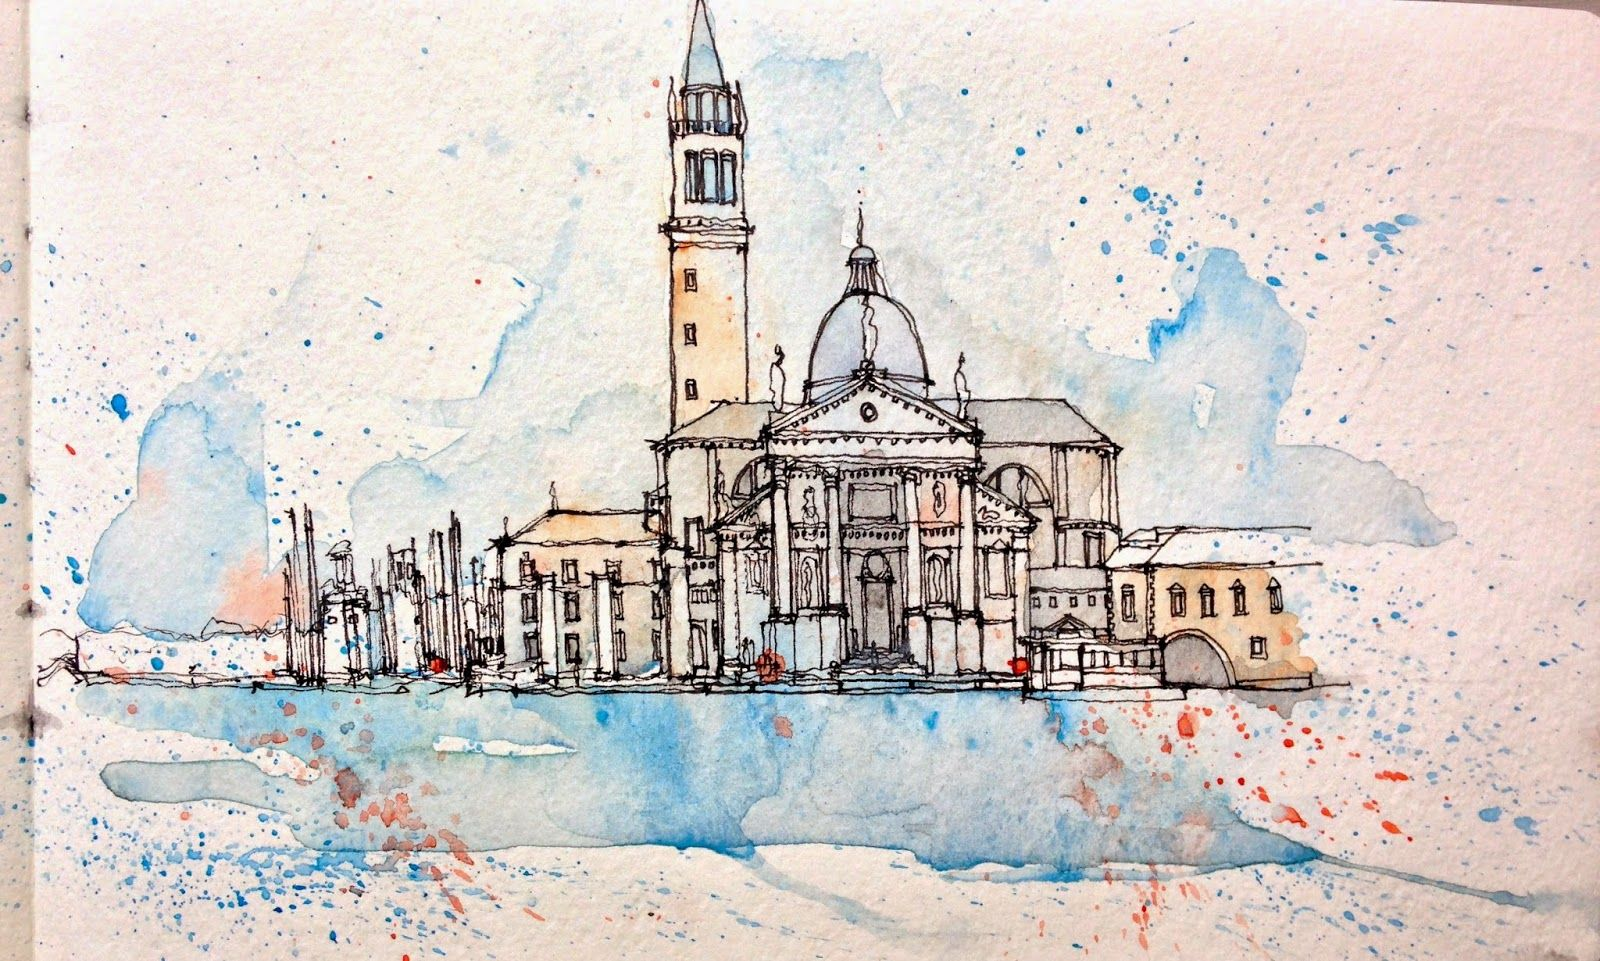 Urban Sketchers: Urban Sketching in Venice